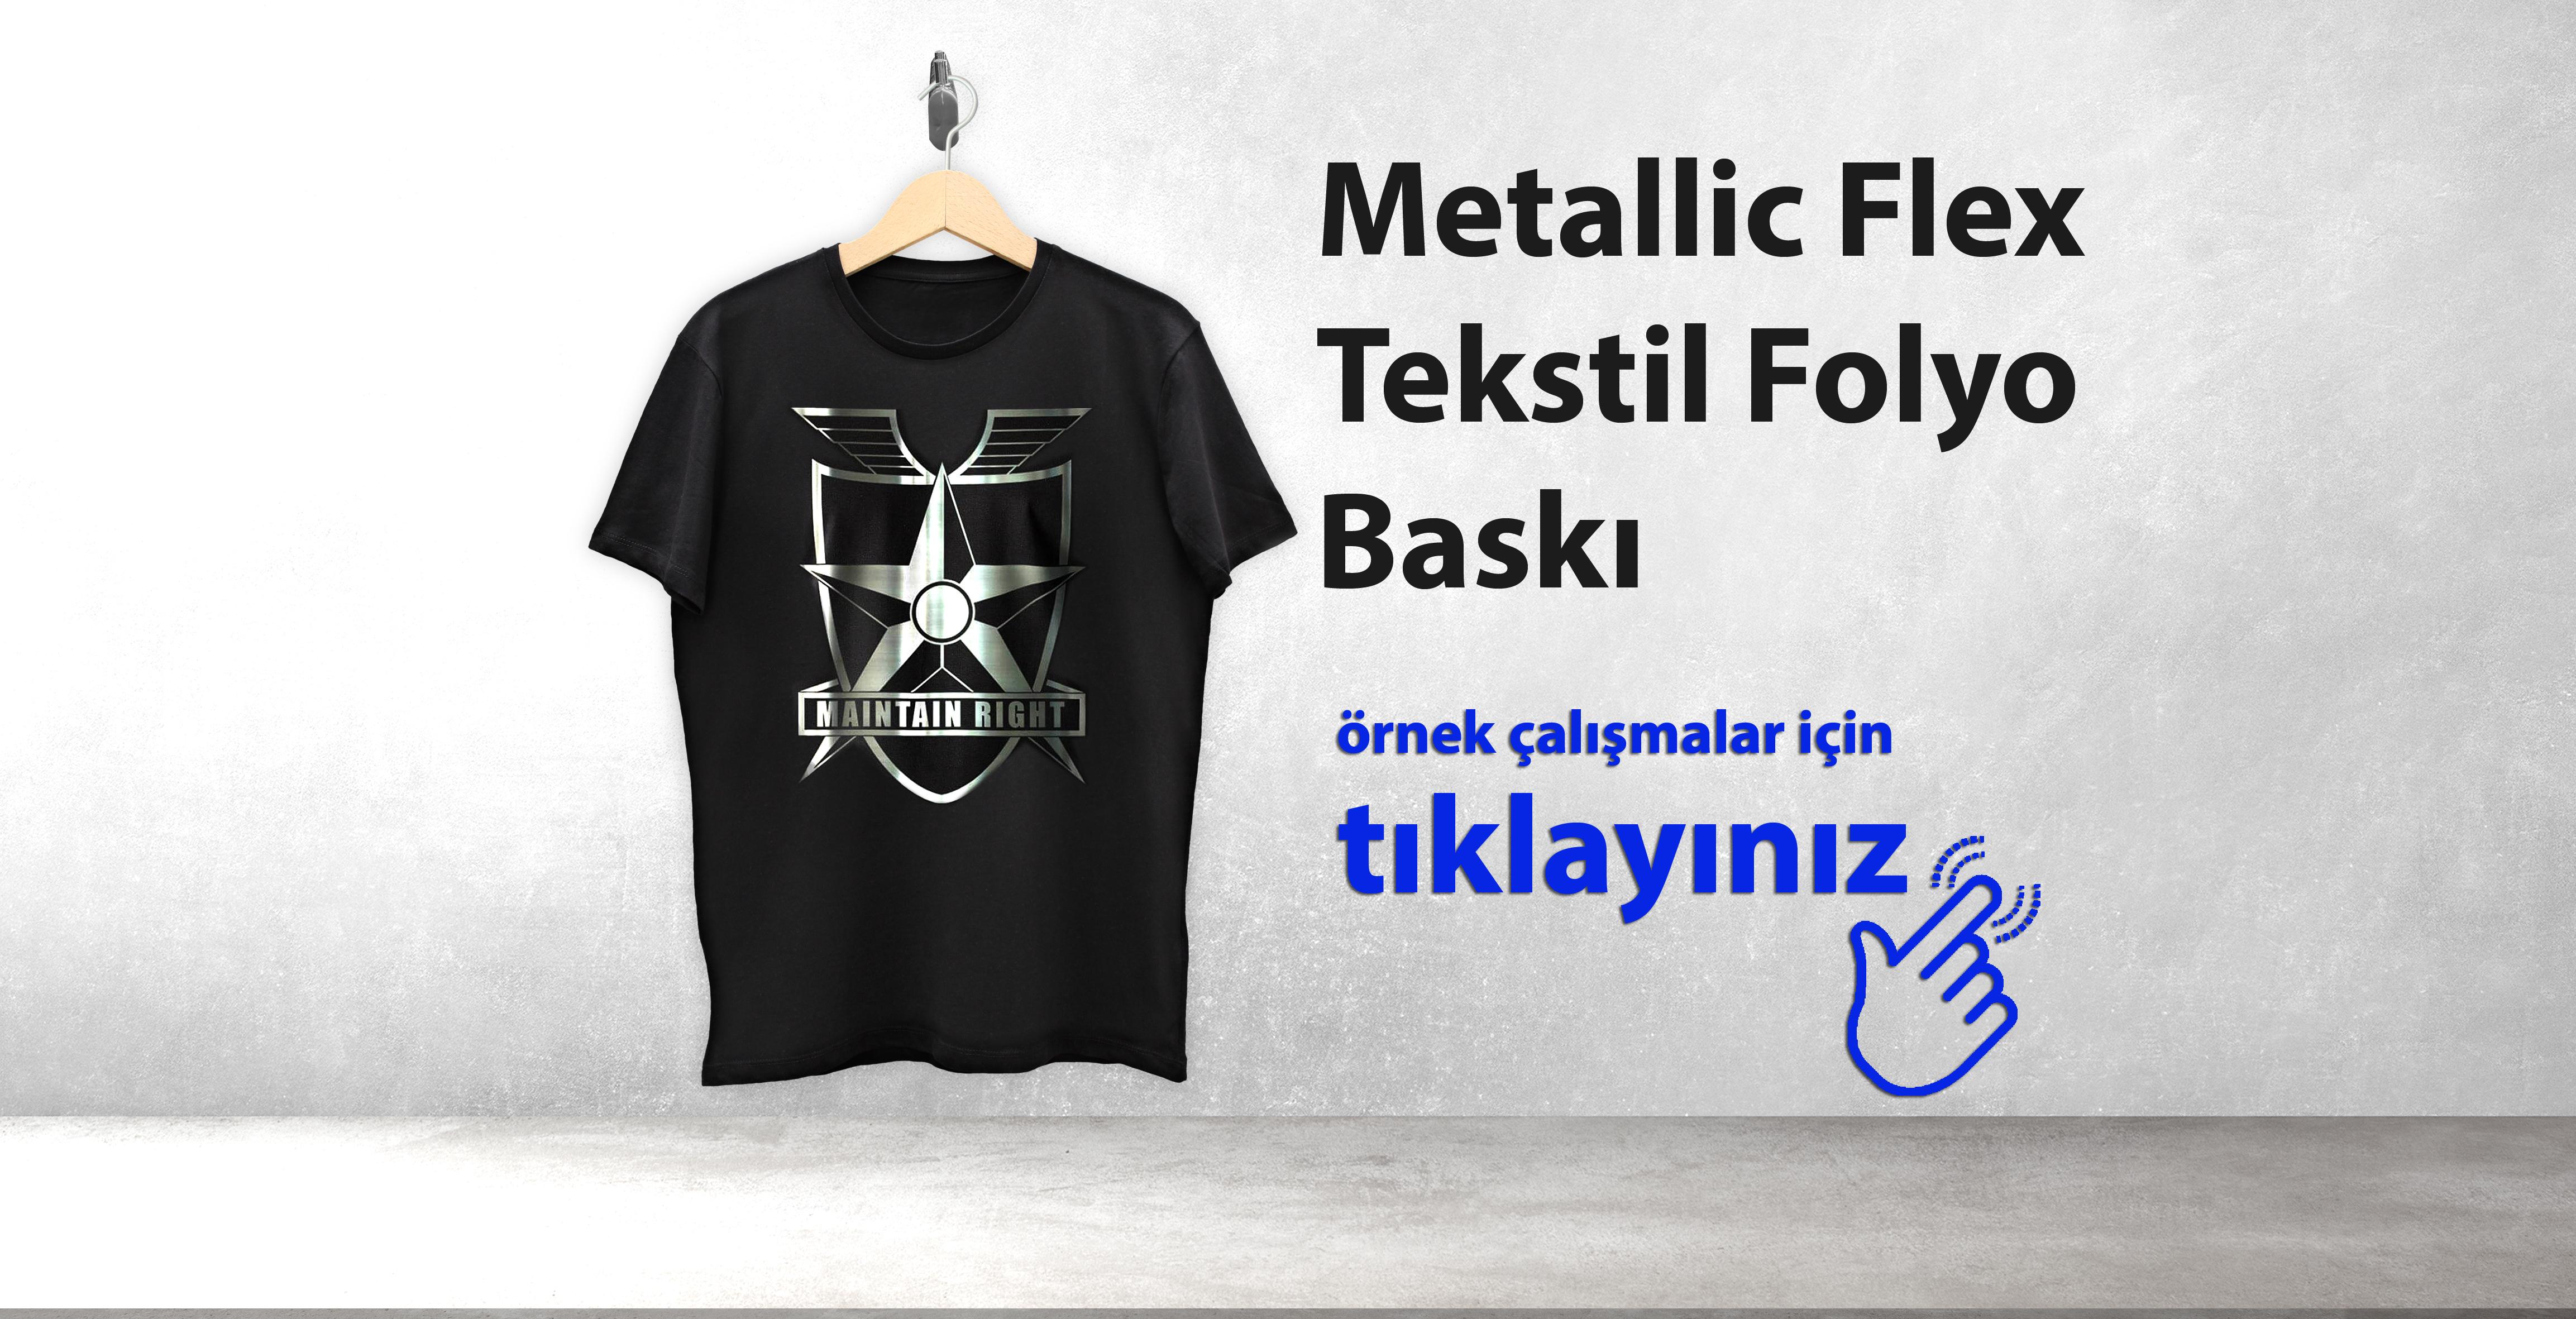 Metallic Flex Tekstil Folyo Baskı